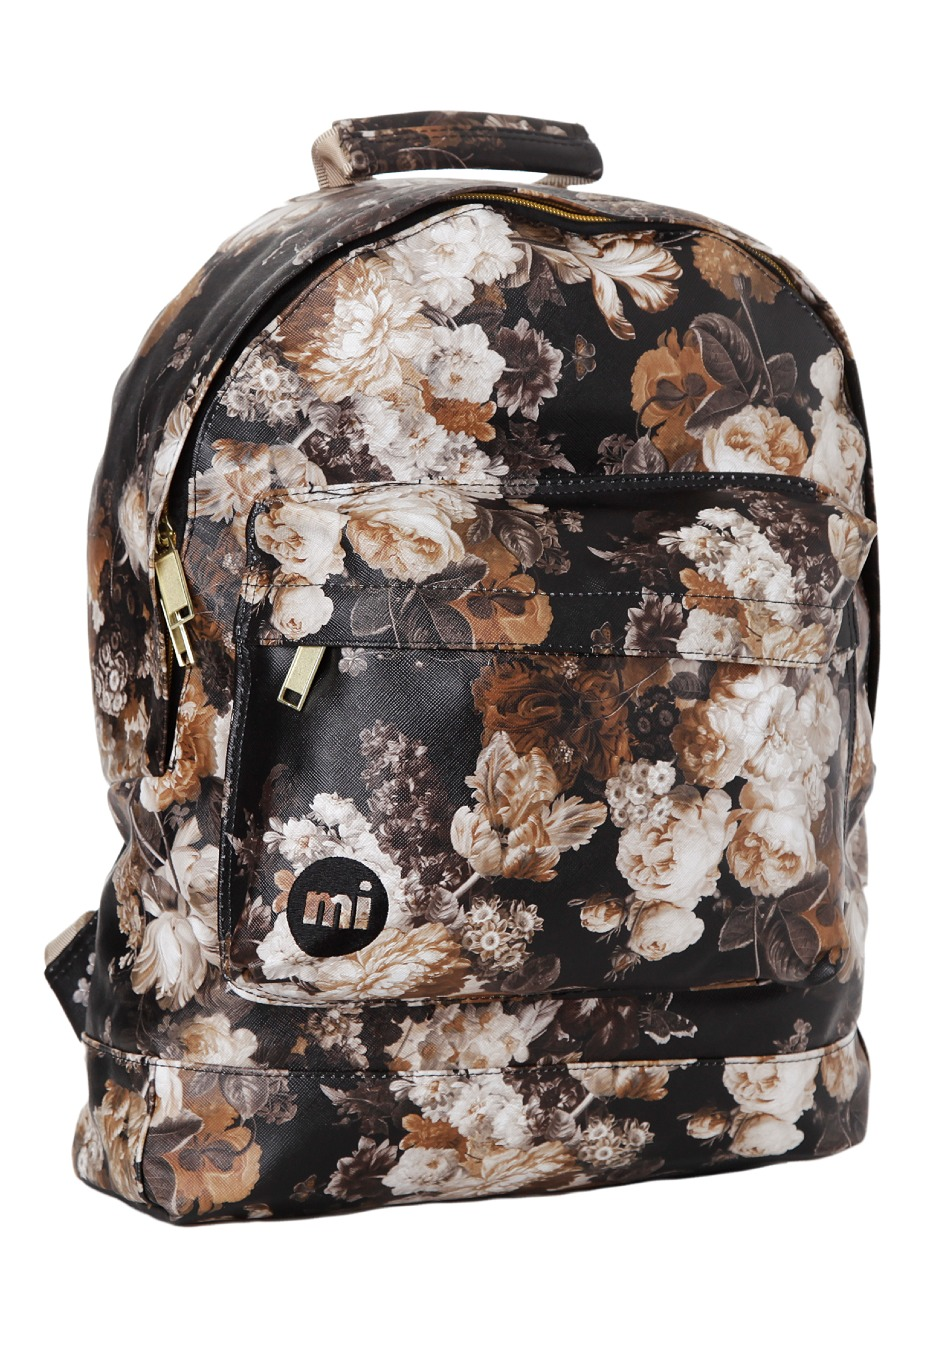 5d22c3bae68a Mi-Pac - Bloom - Backpack - Streetwear Shop - Impericon.com US